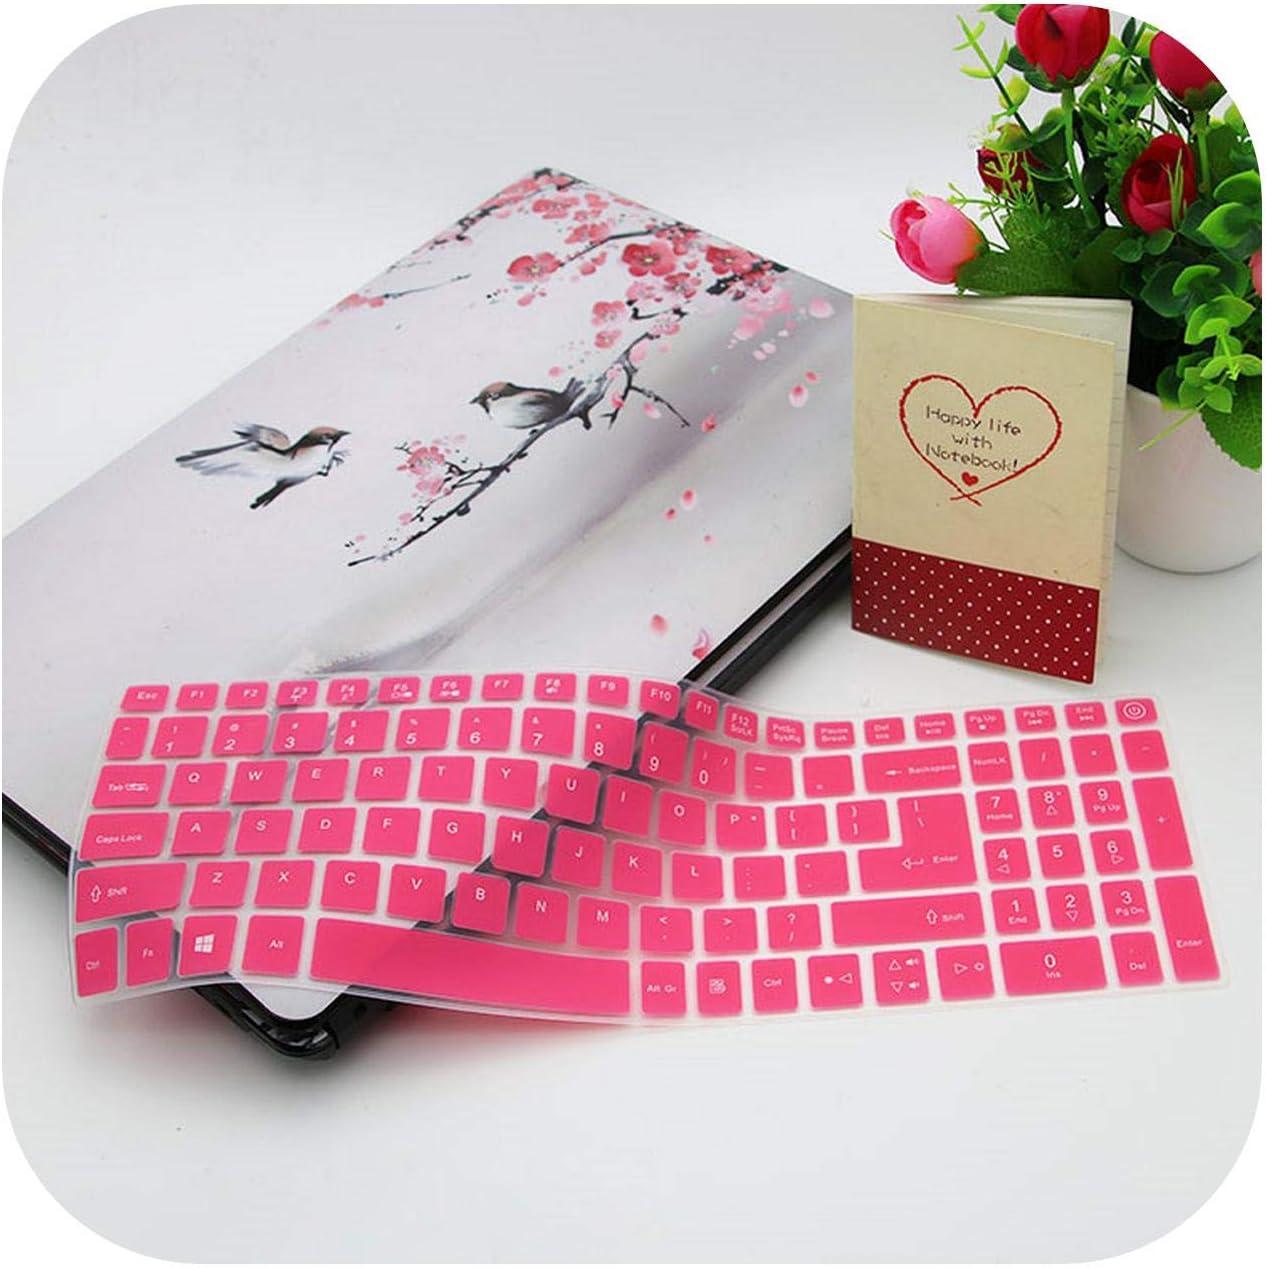 15.6 Inch Keyboard Silicone Keyboard Cover Protector Skin for Acer Aspire Vn7-592G Vn7-792G F15 F5-571 F5-573G E5-575G E5-772-Pink-